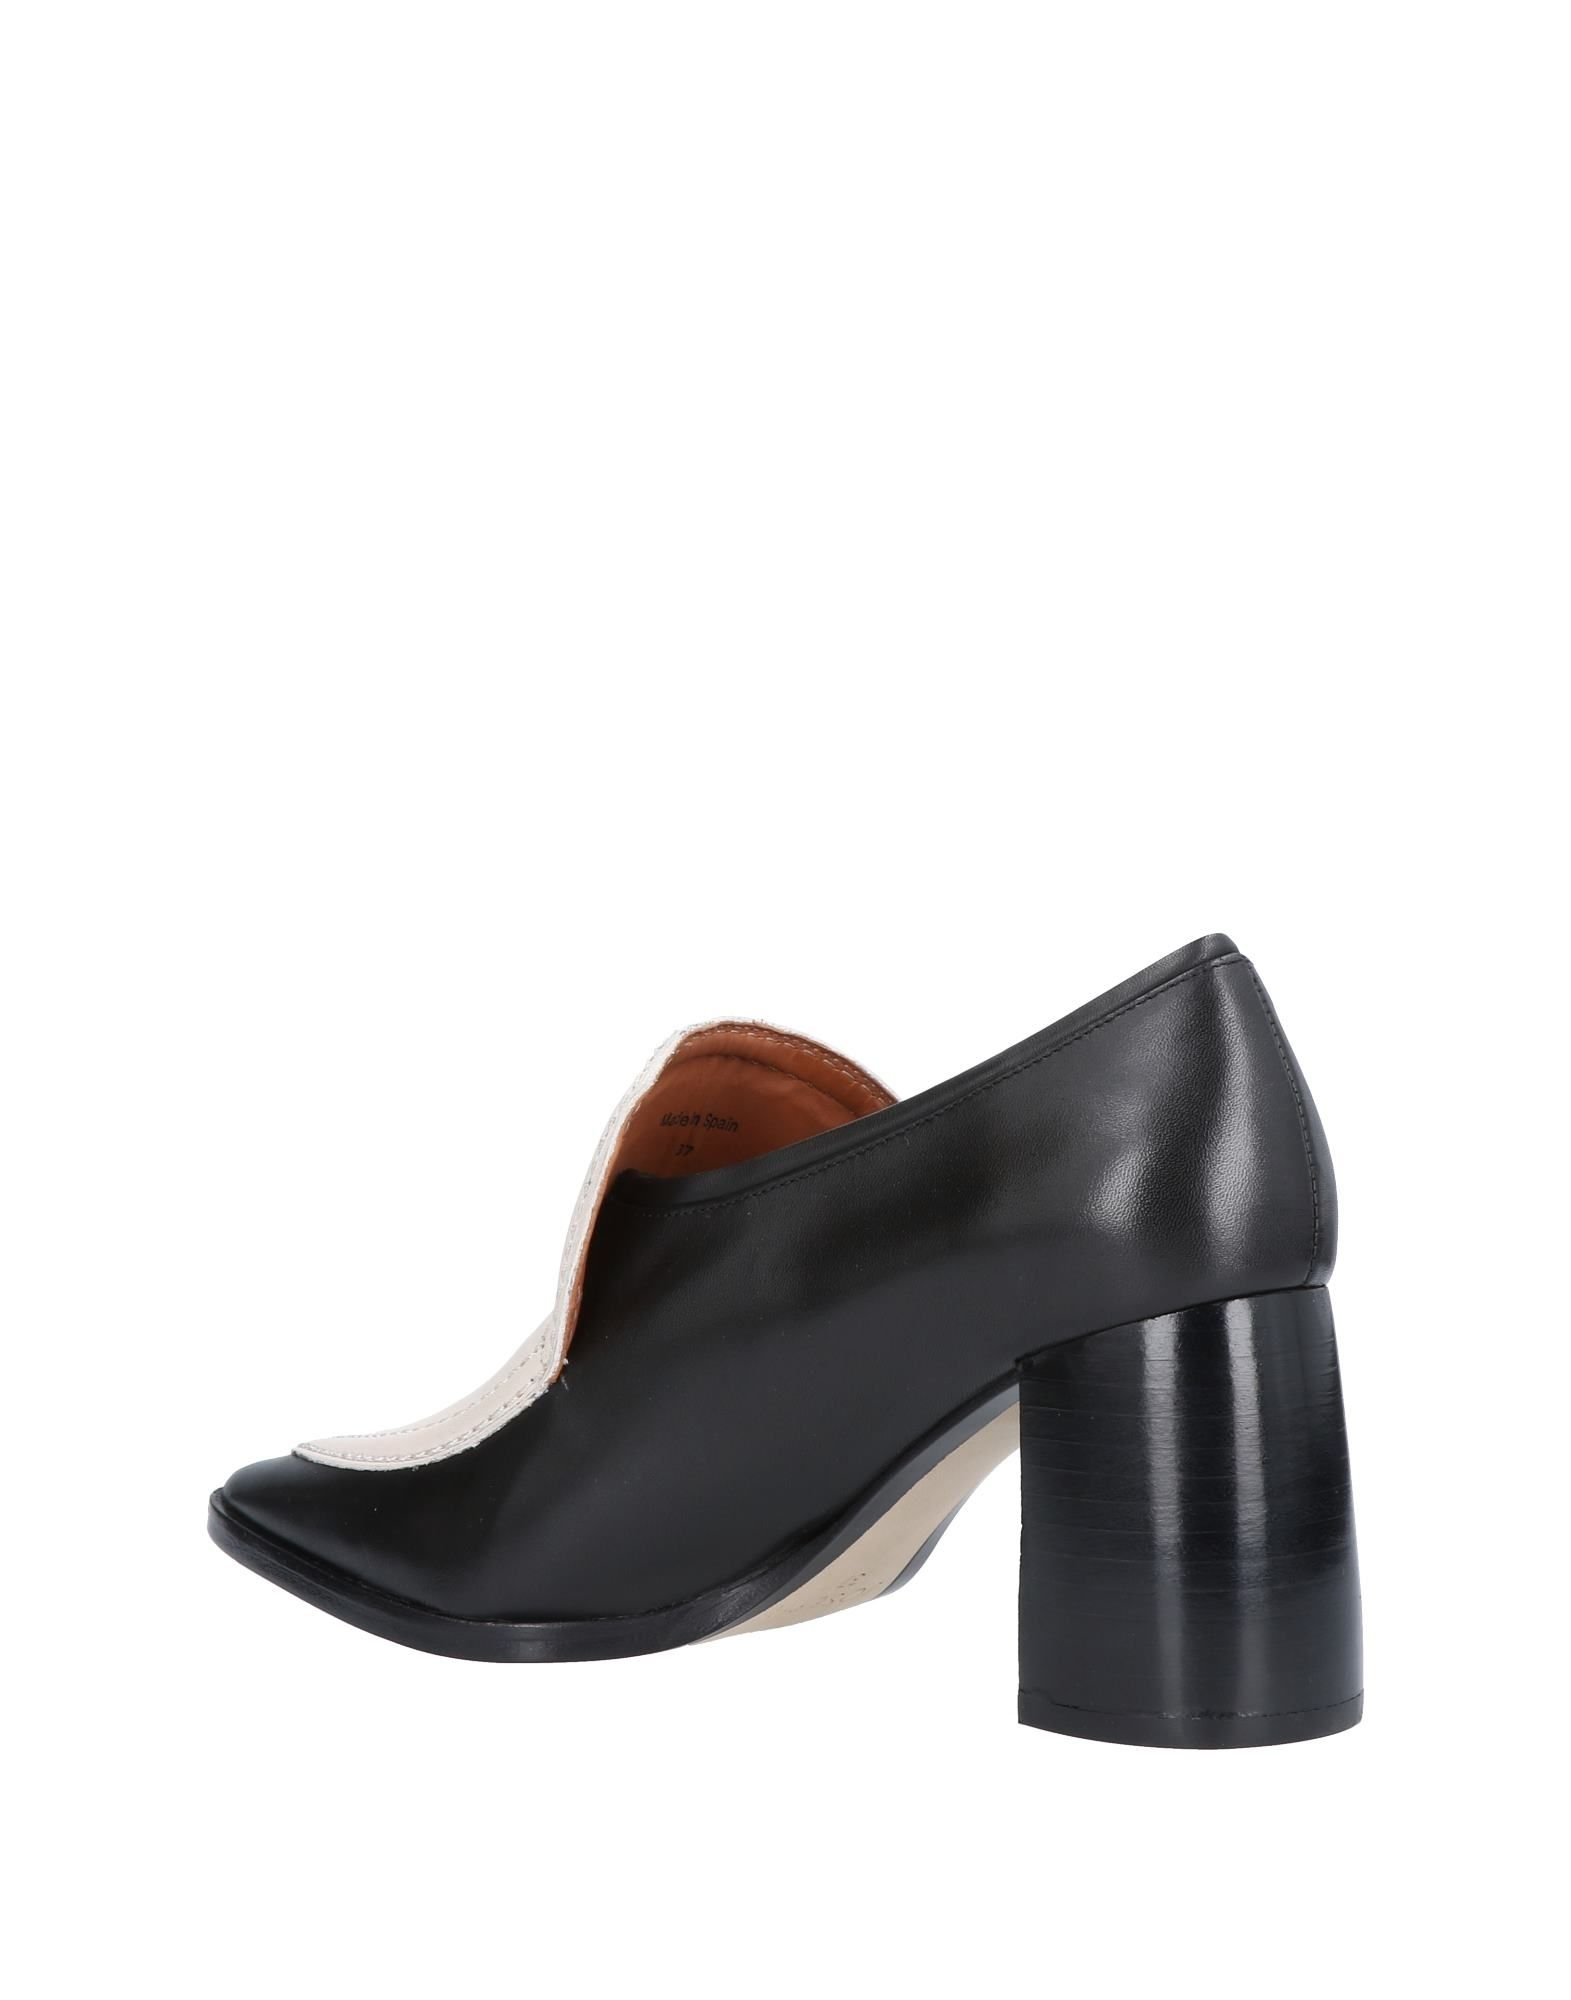 Joseph aussehende Mokassins Damen  11481052EDGut aussehende Joseph strapazierfähige Schuhe 556b1c